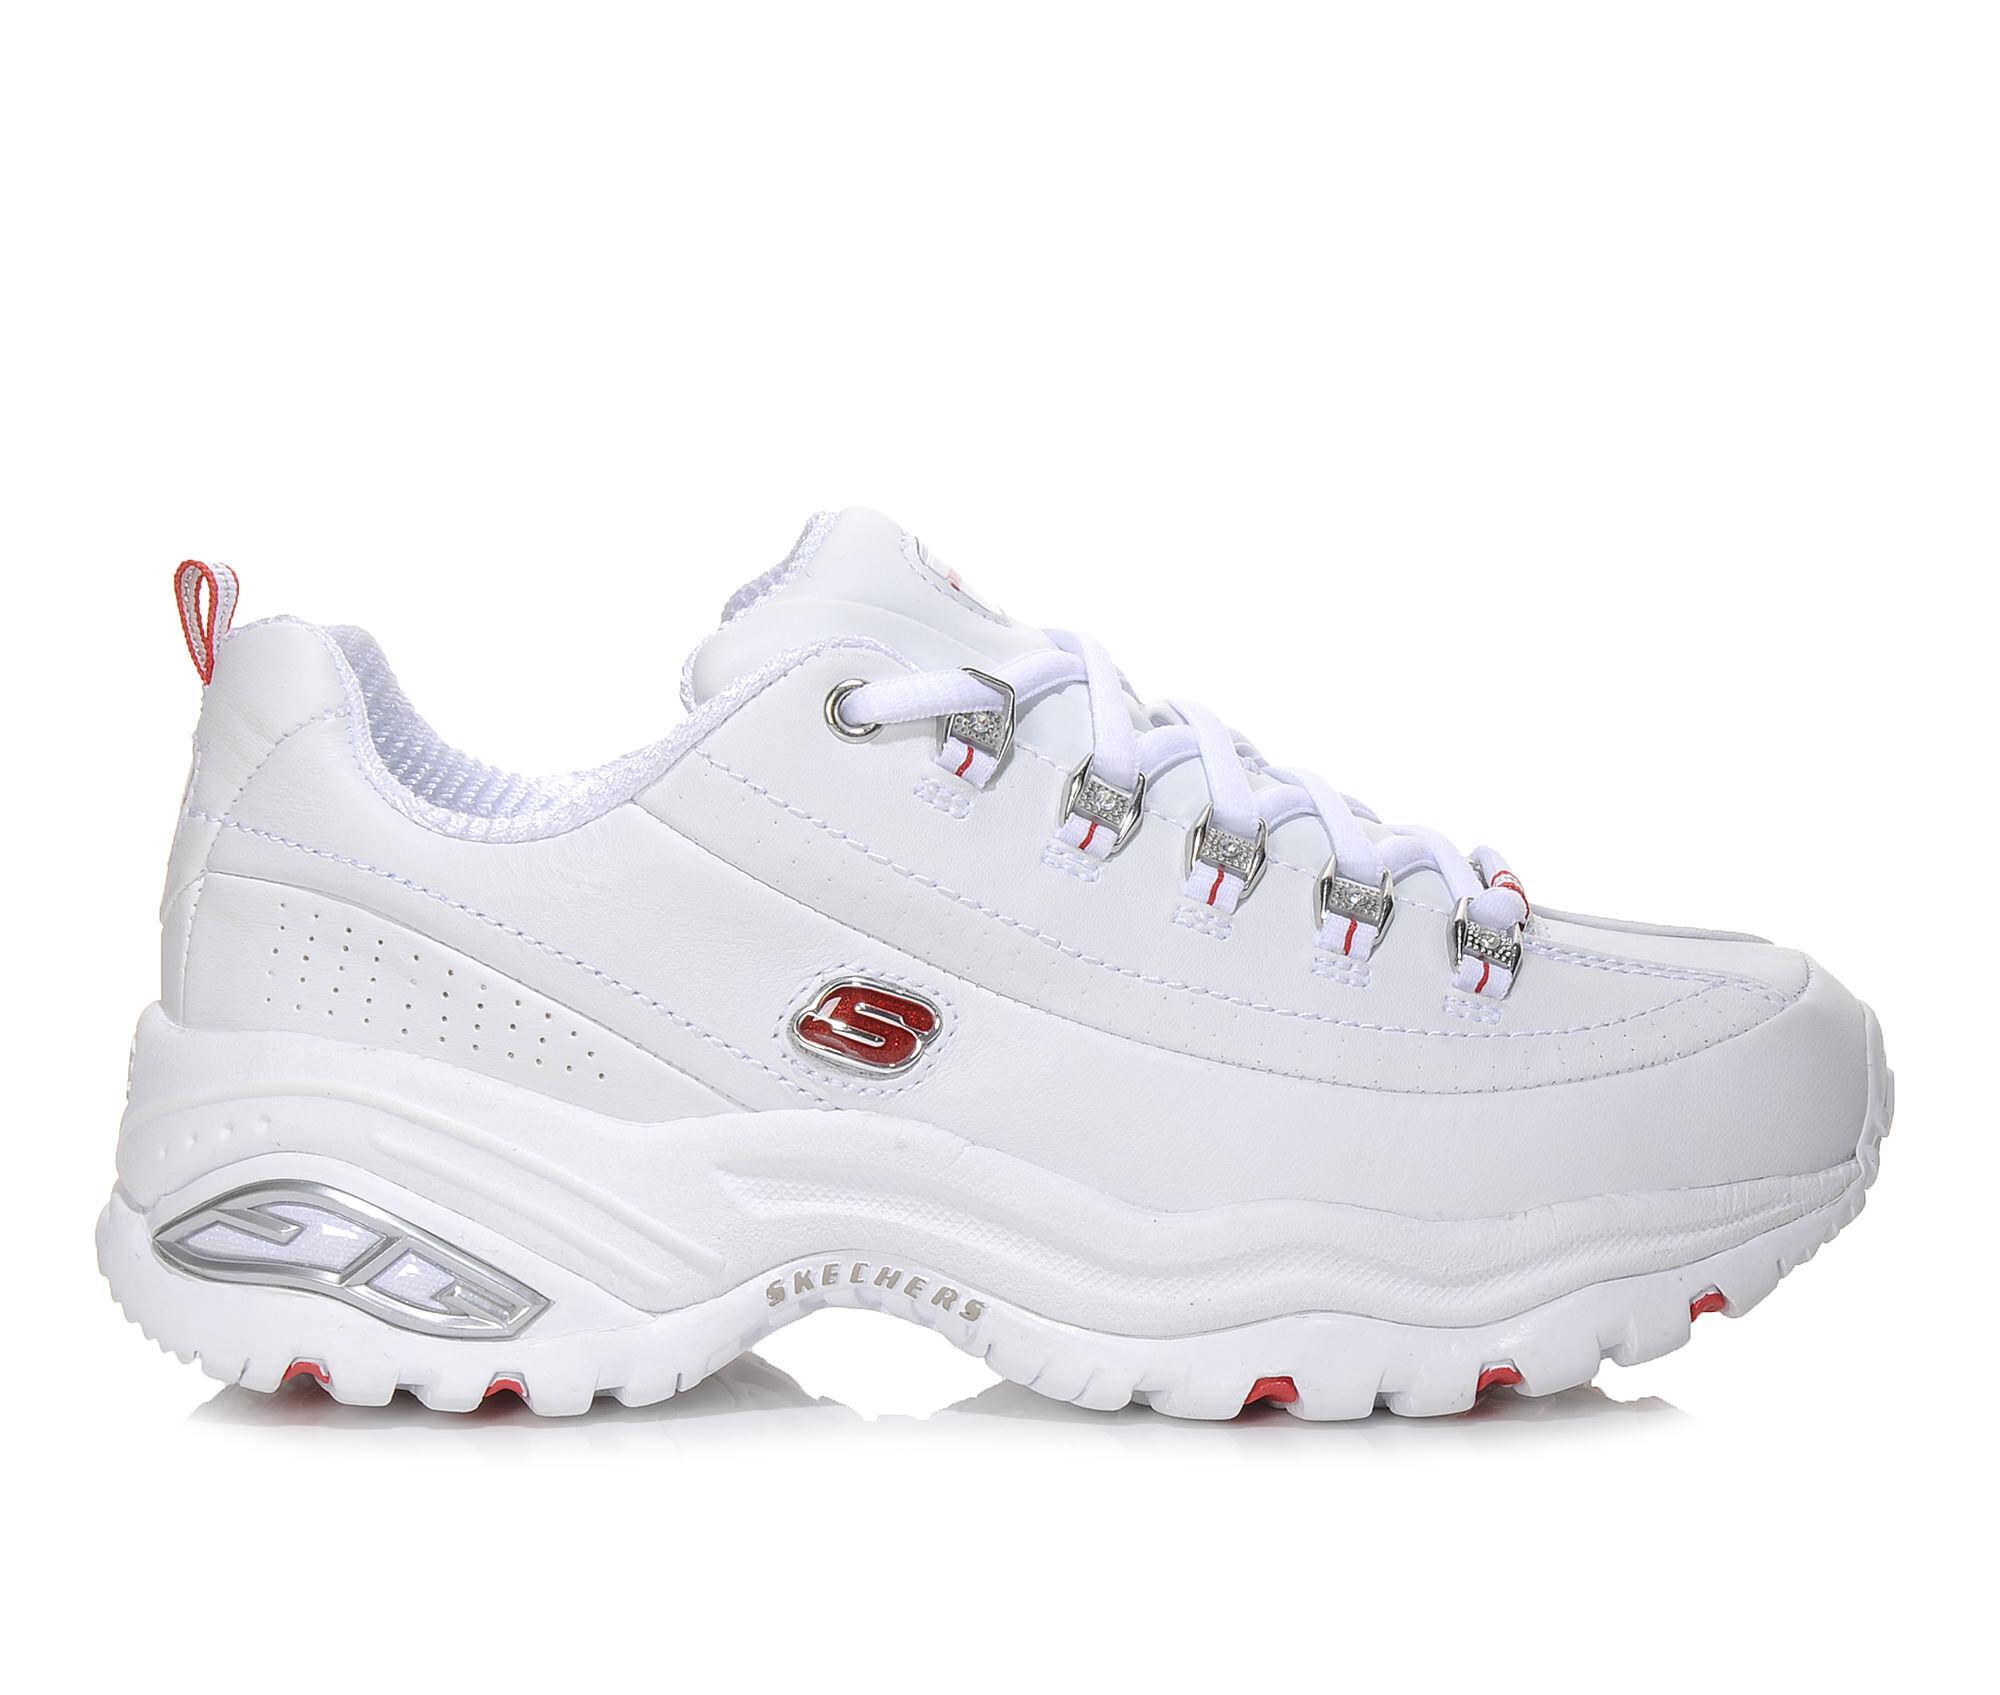 uk shoes_kd3188